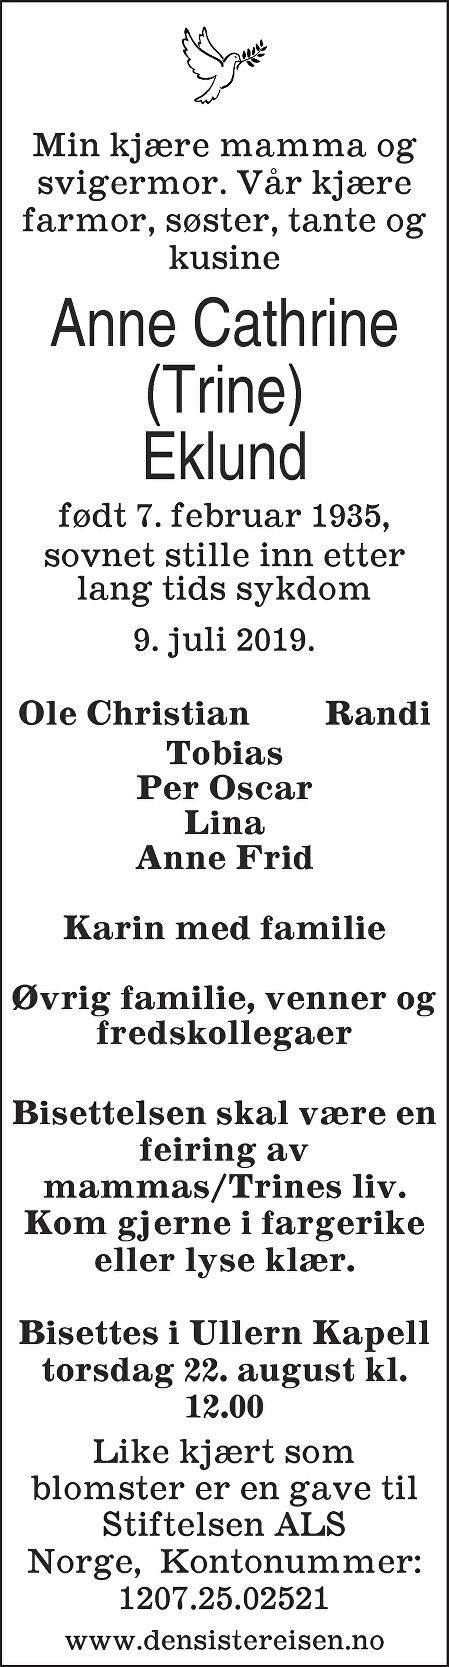 Trine Eklund Dødsannonse